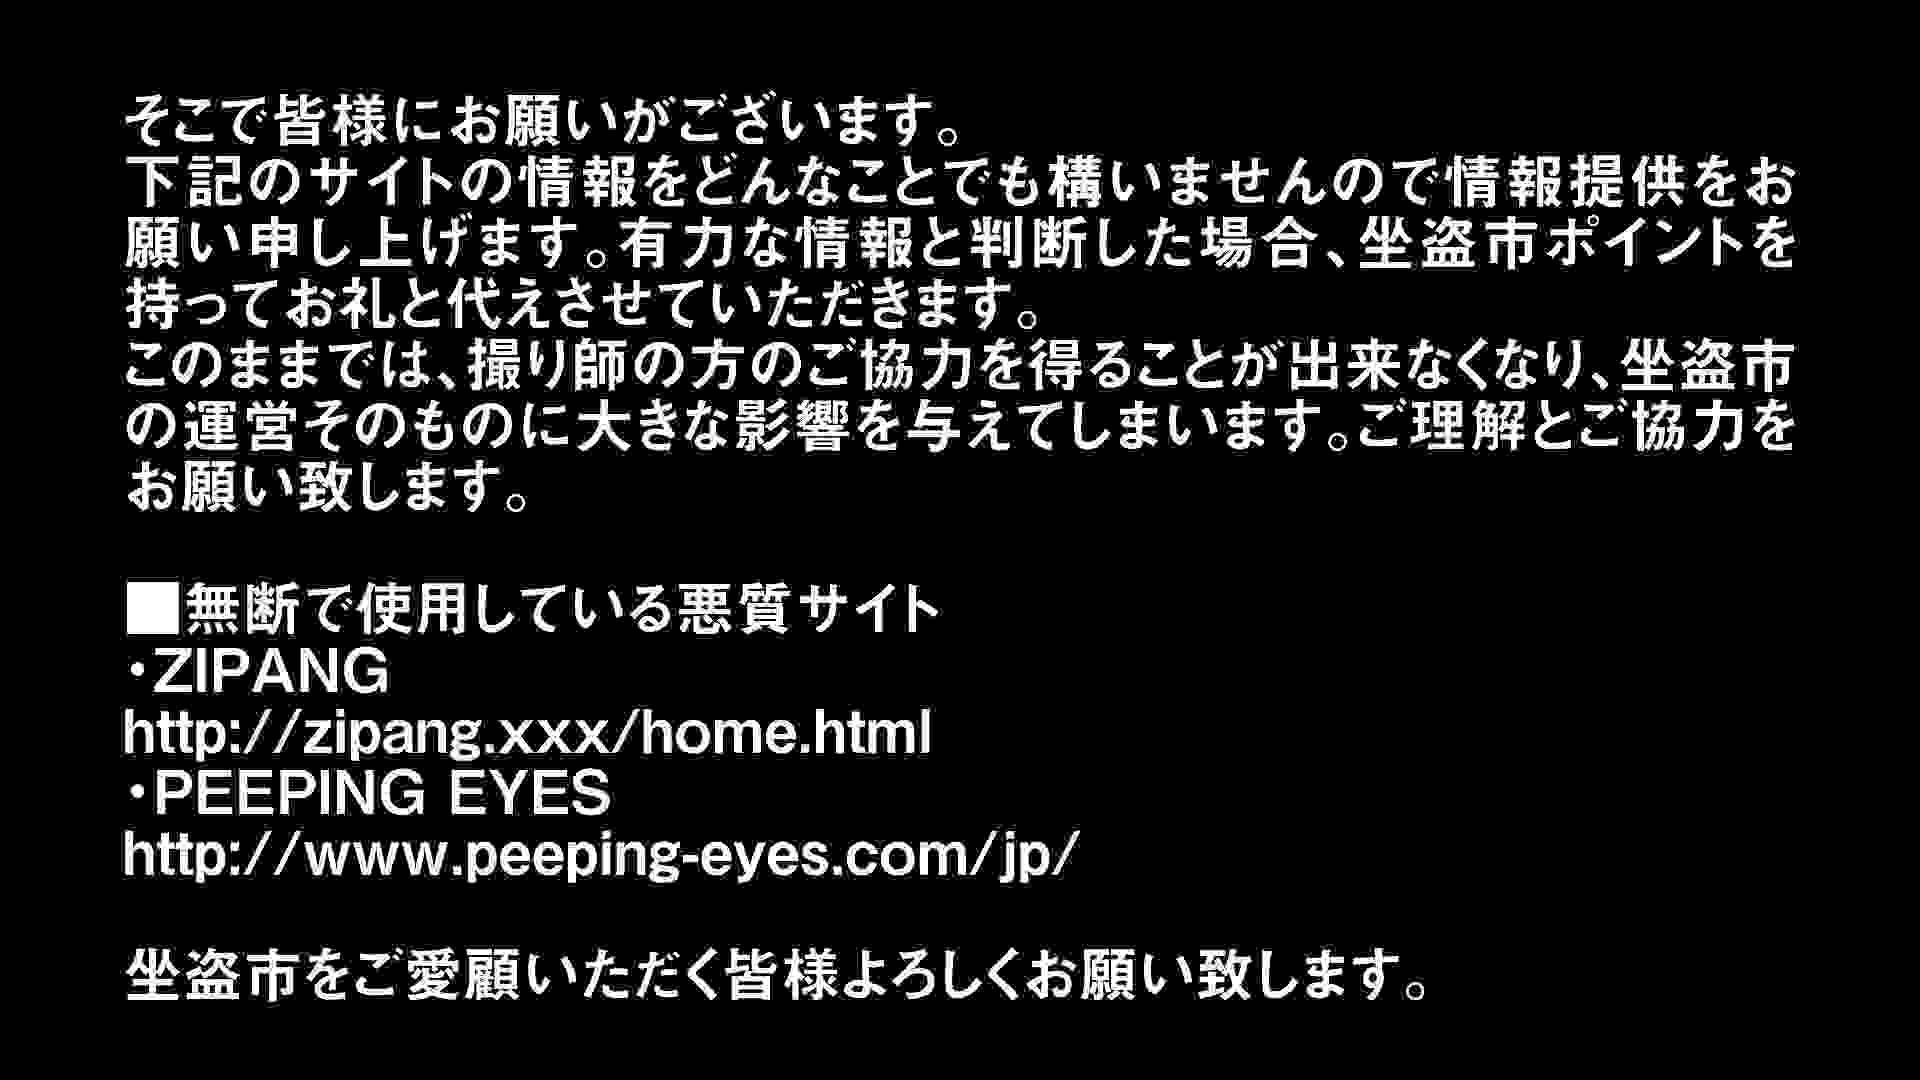 Aquaな露天風呂Vol.301 OLセックス 隠し撮りすけべAV動画紹介 85画像 29